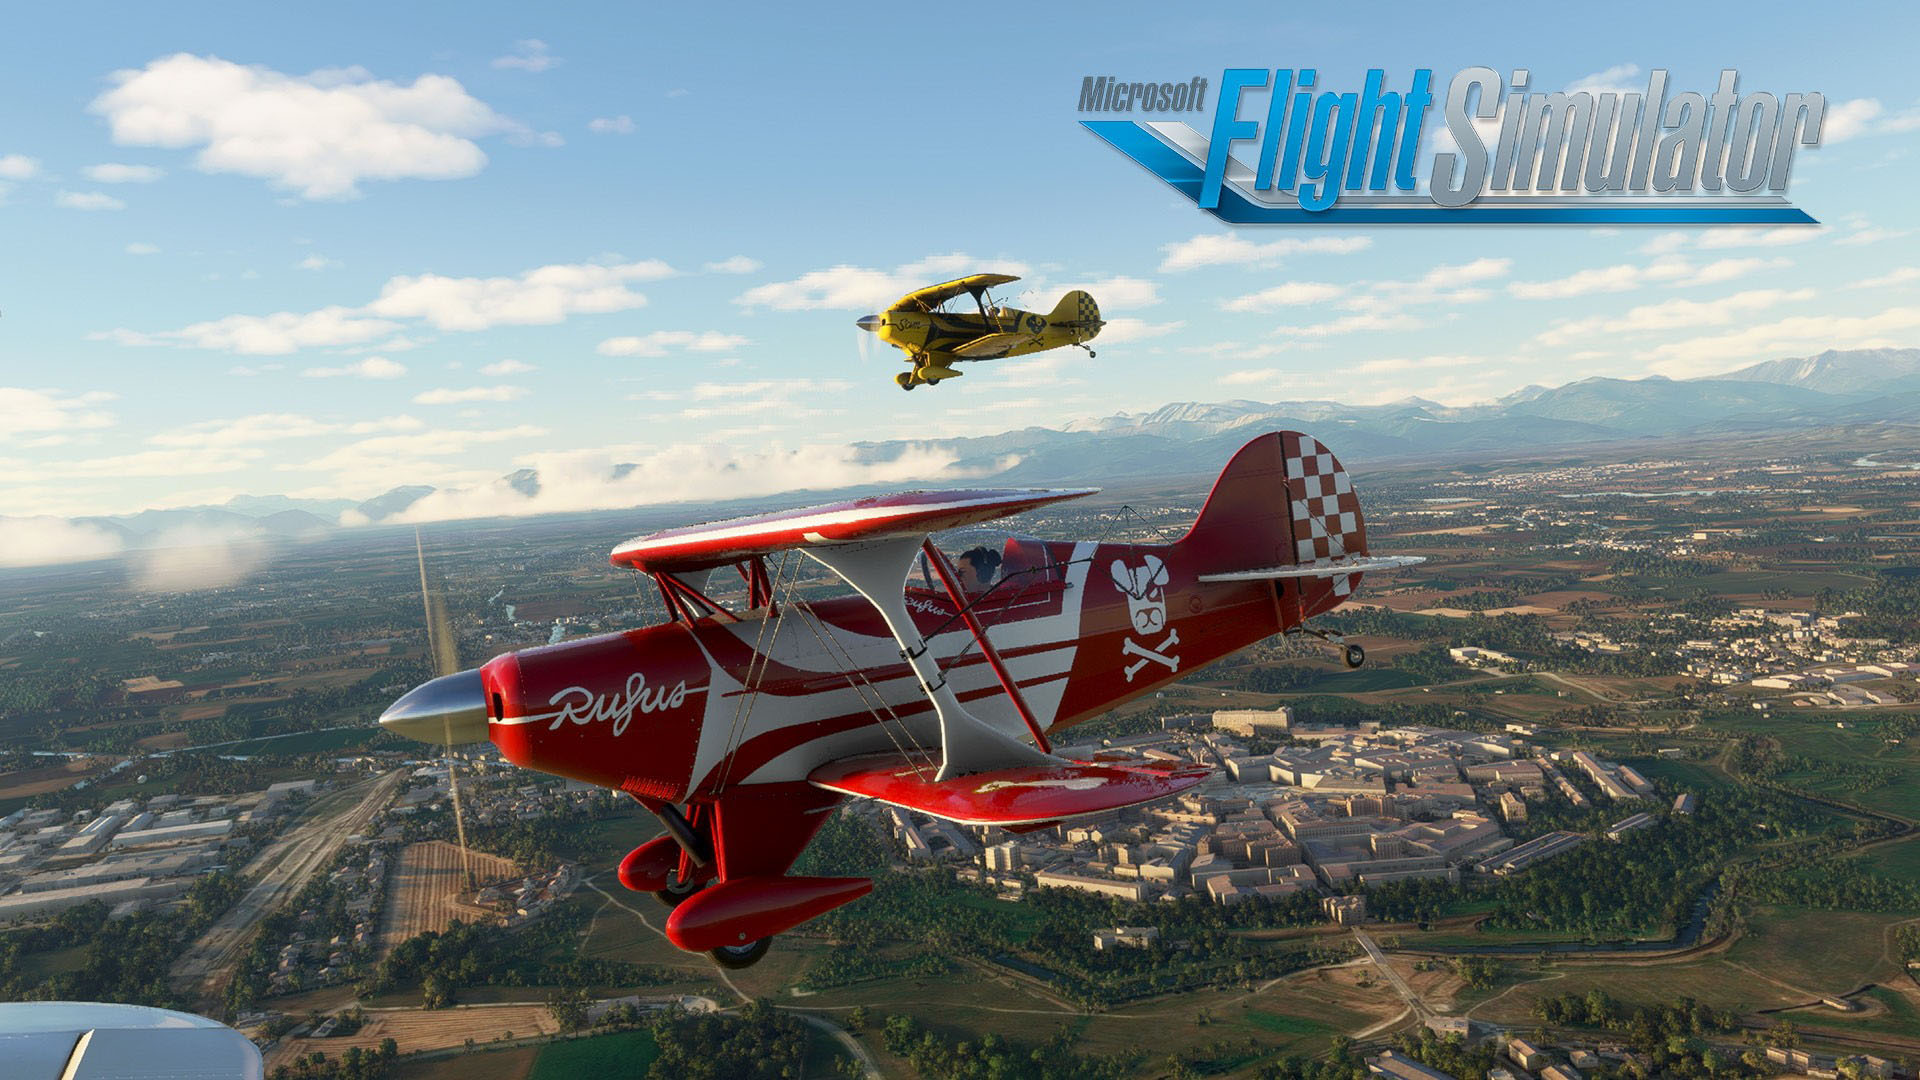 Micfrosoft Flight Simulator